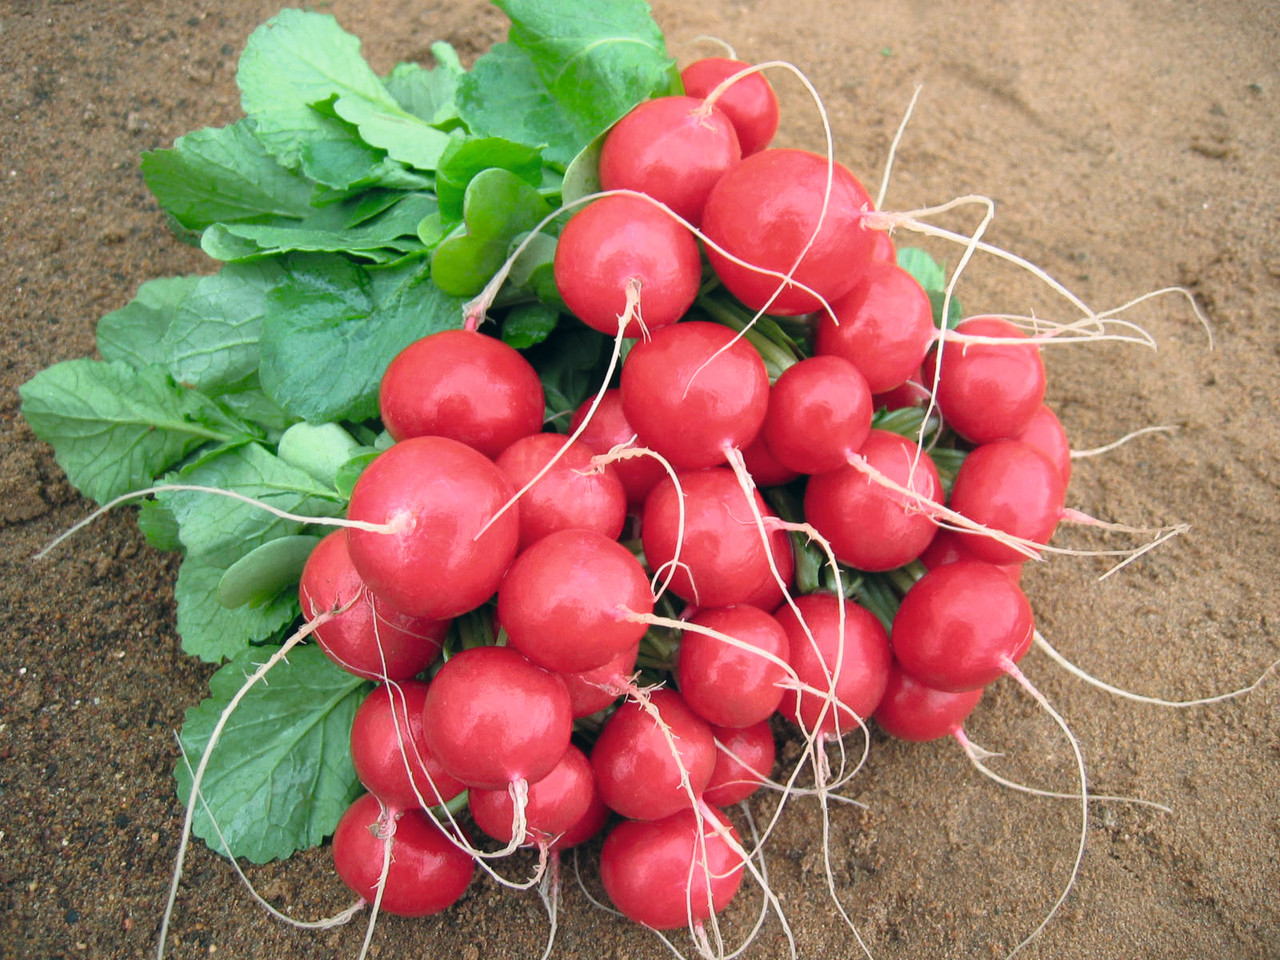 Ролекс F1 - семена редиса, Bejo - 5 000 семян 2.50-2.75